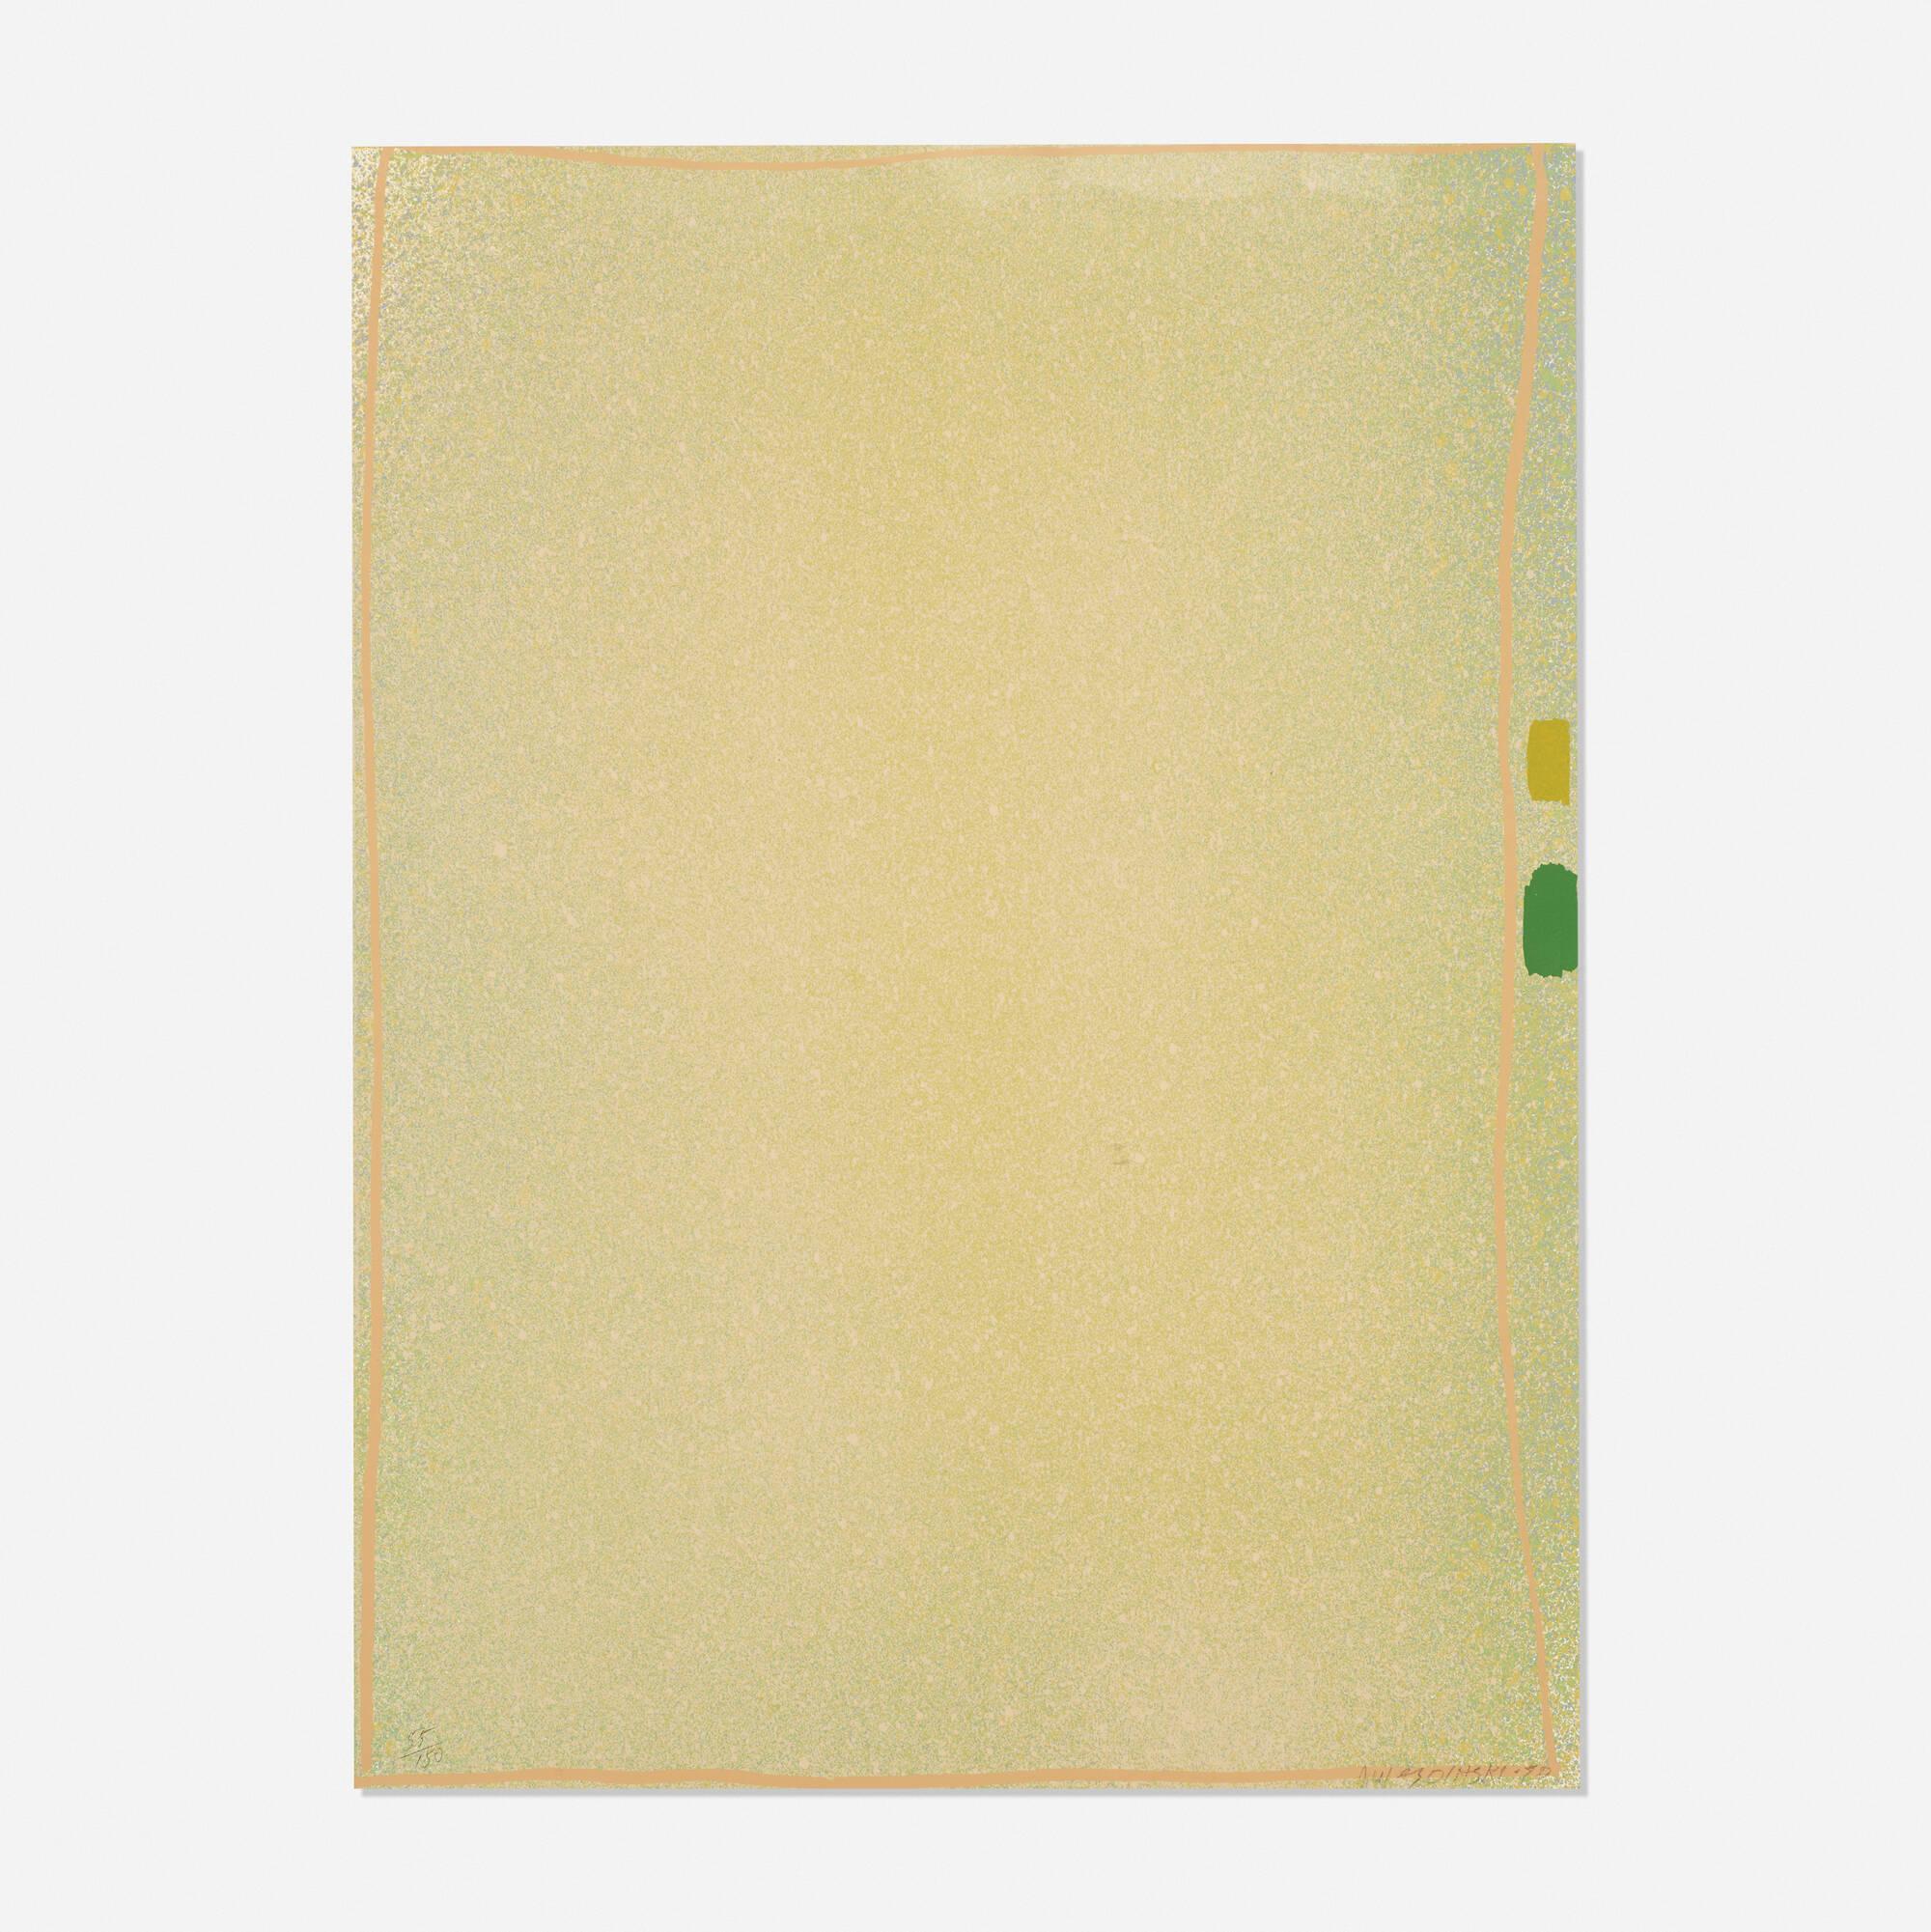 171: Jules Olitski / Graphite Suite I (Yellow/Green with Flesh) (1 of 1)